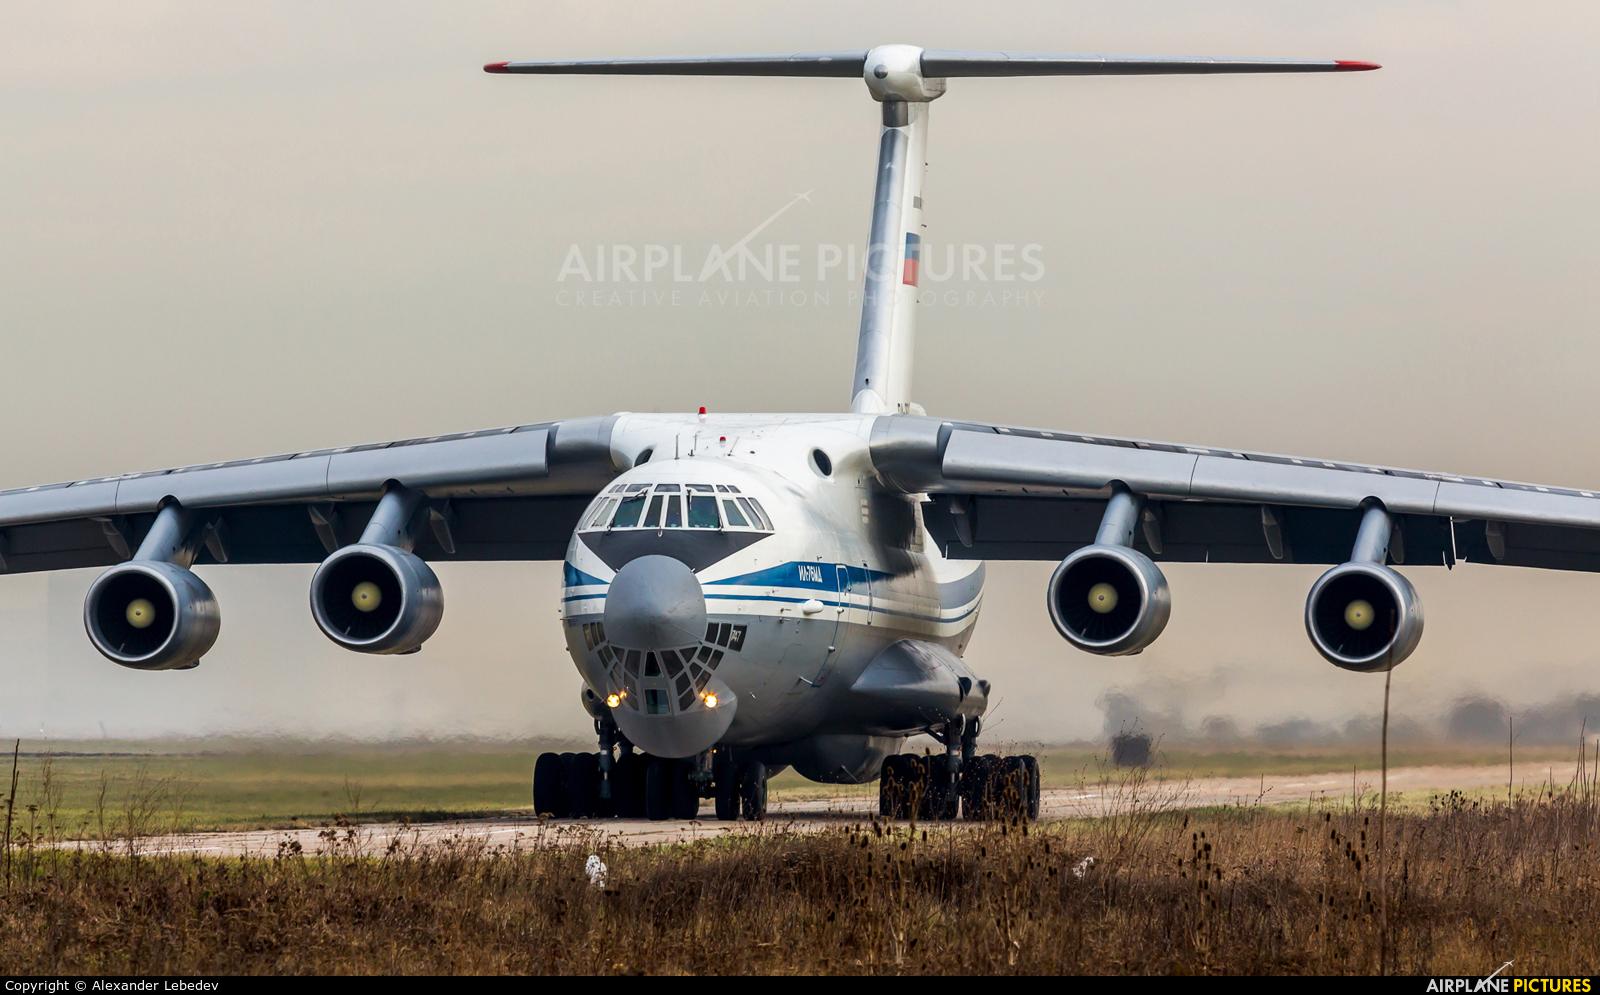 Russia - Air Force RA-76747 aircraft at Krasnodar Tsentralny